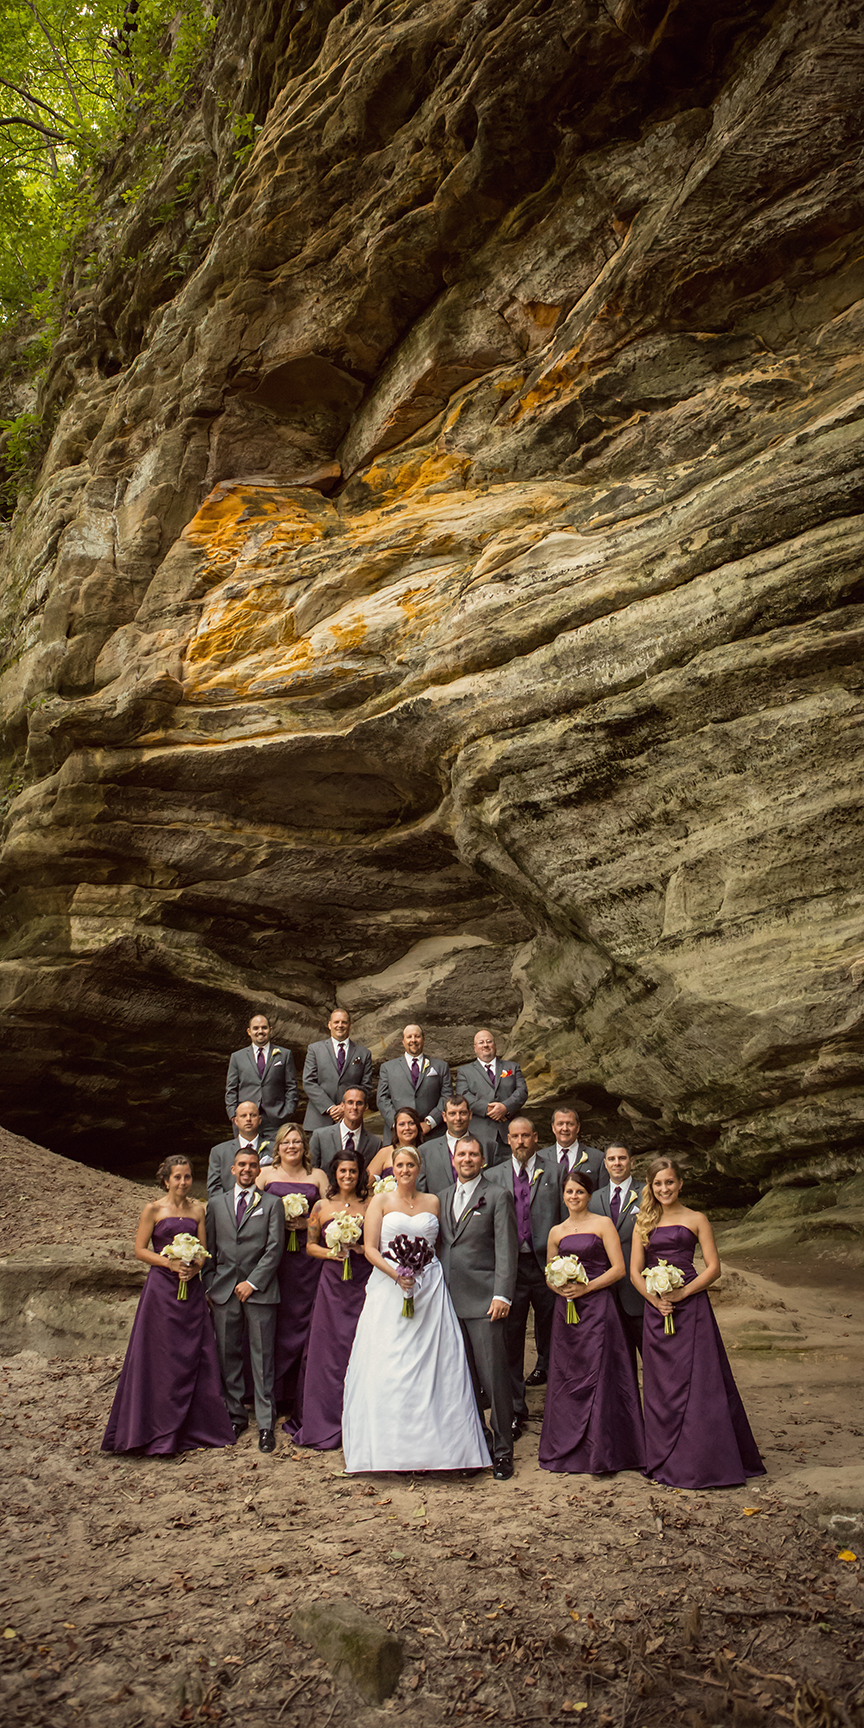 Justin Harris Wedding Photography